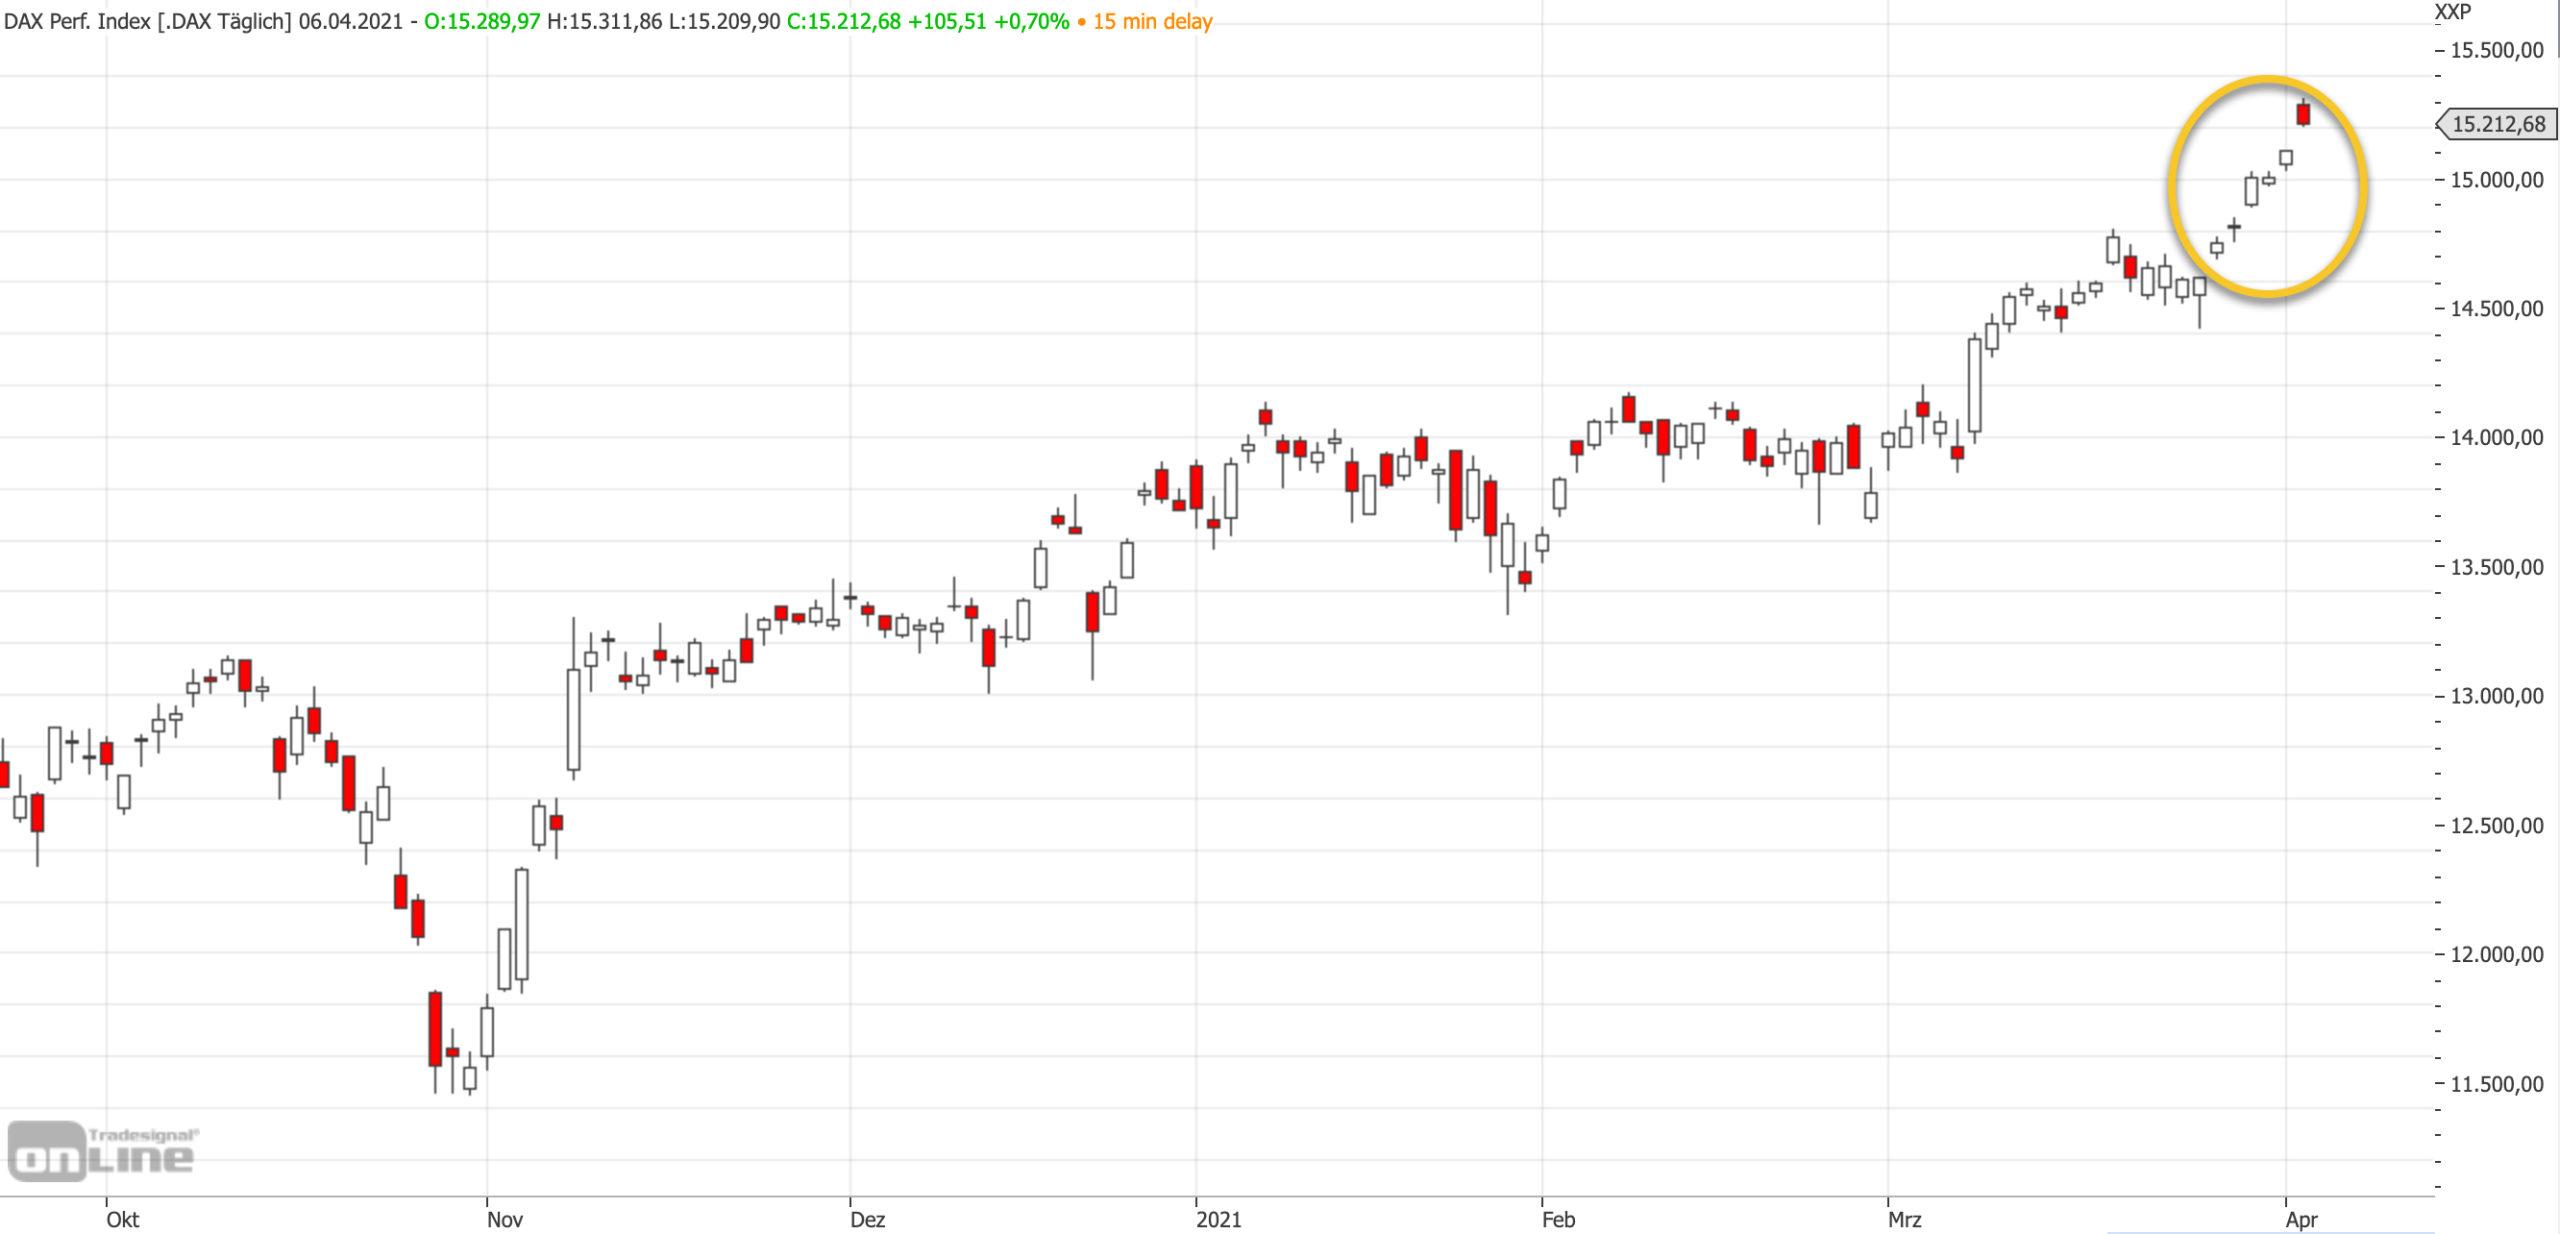 Mittelfristiger DAX-Chart am 06.04.2021